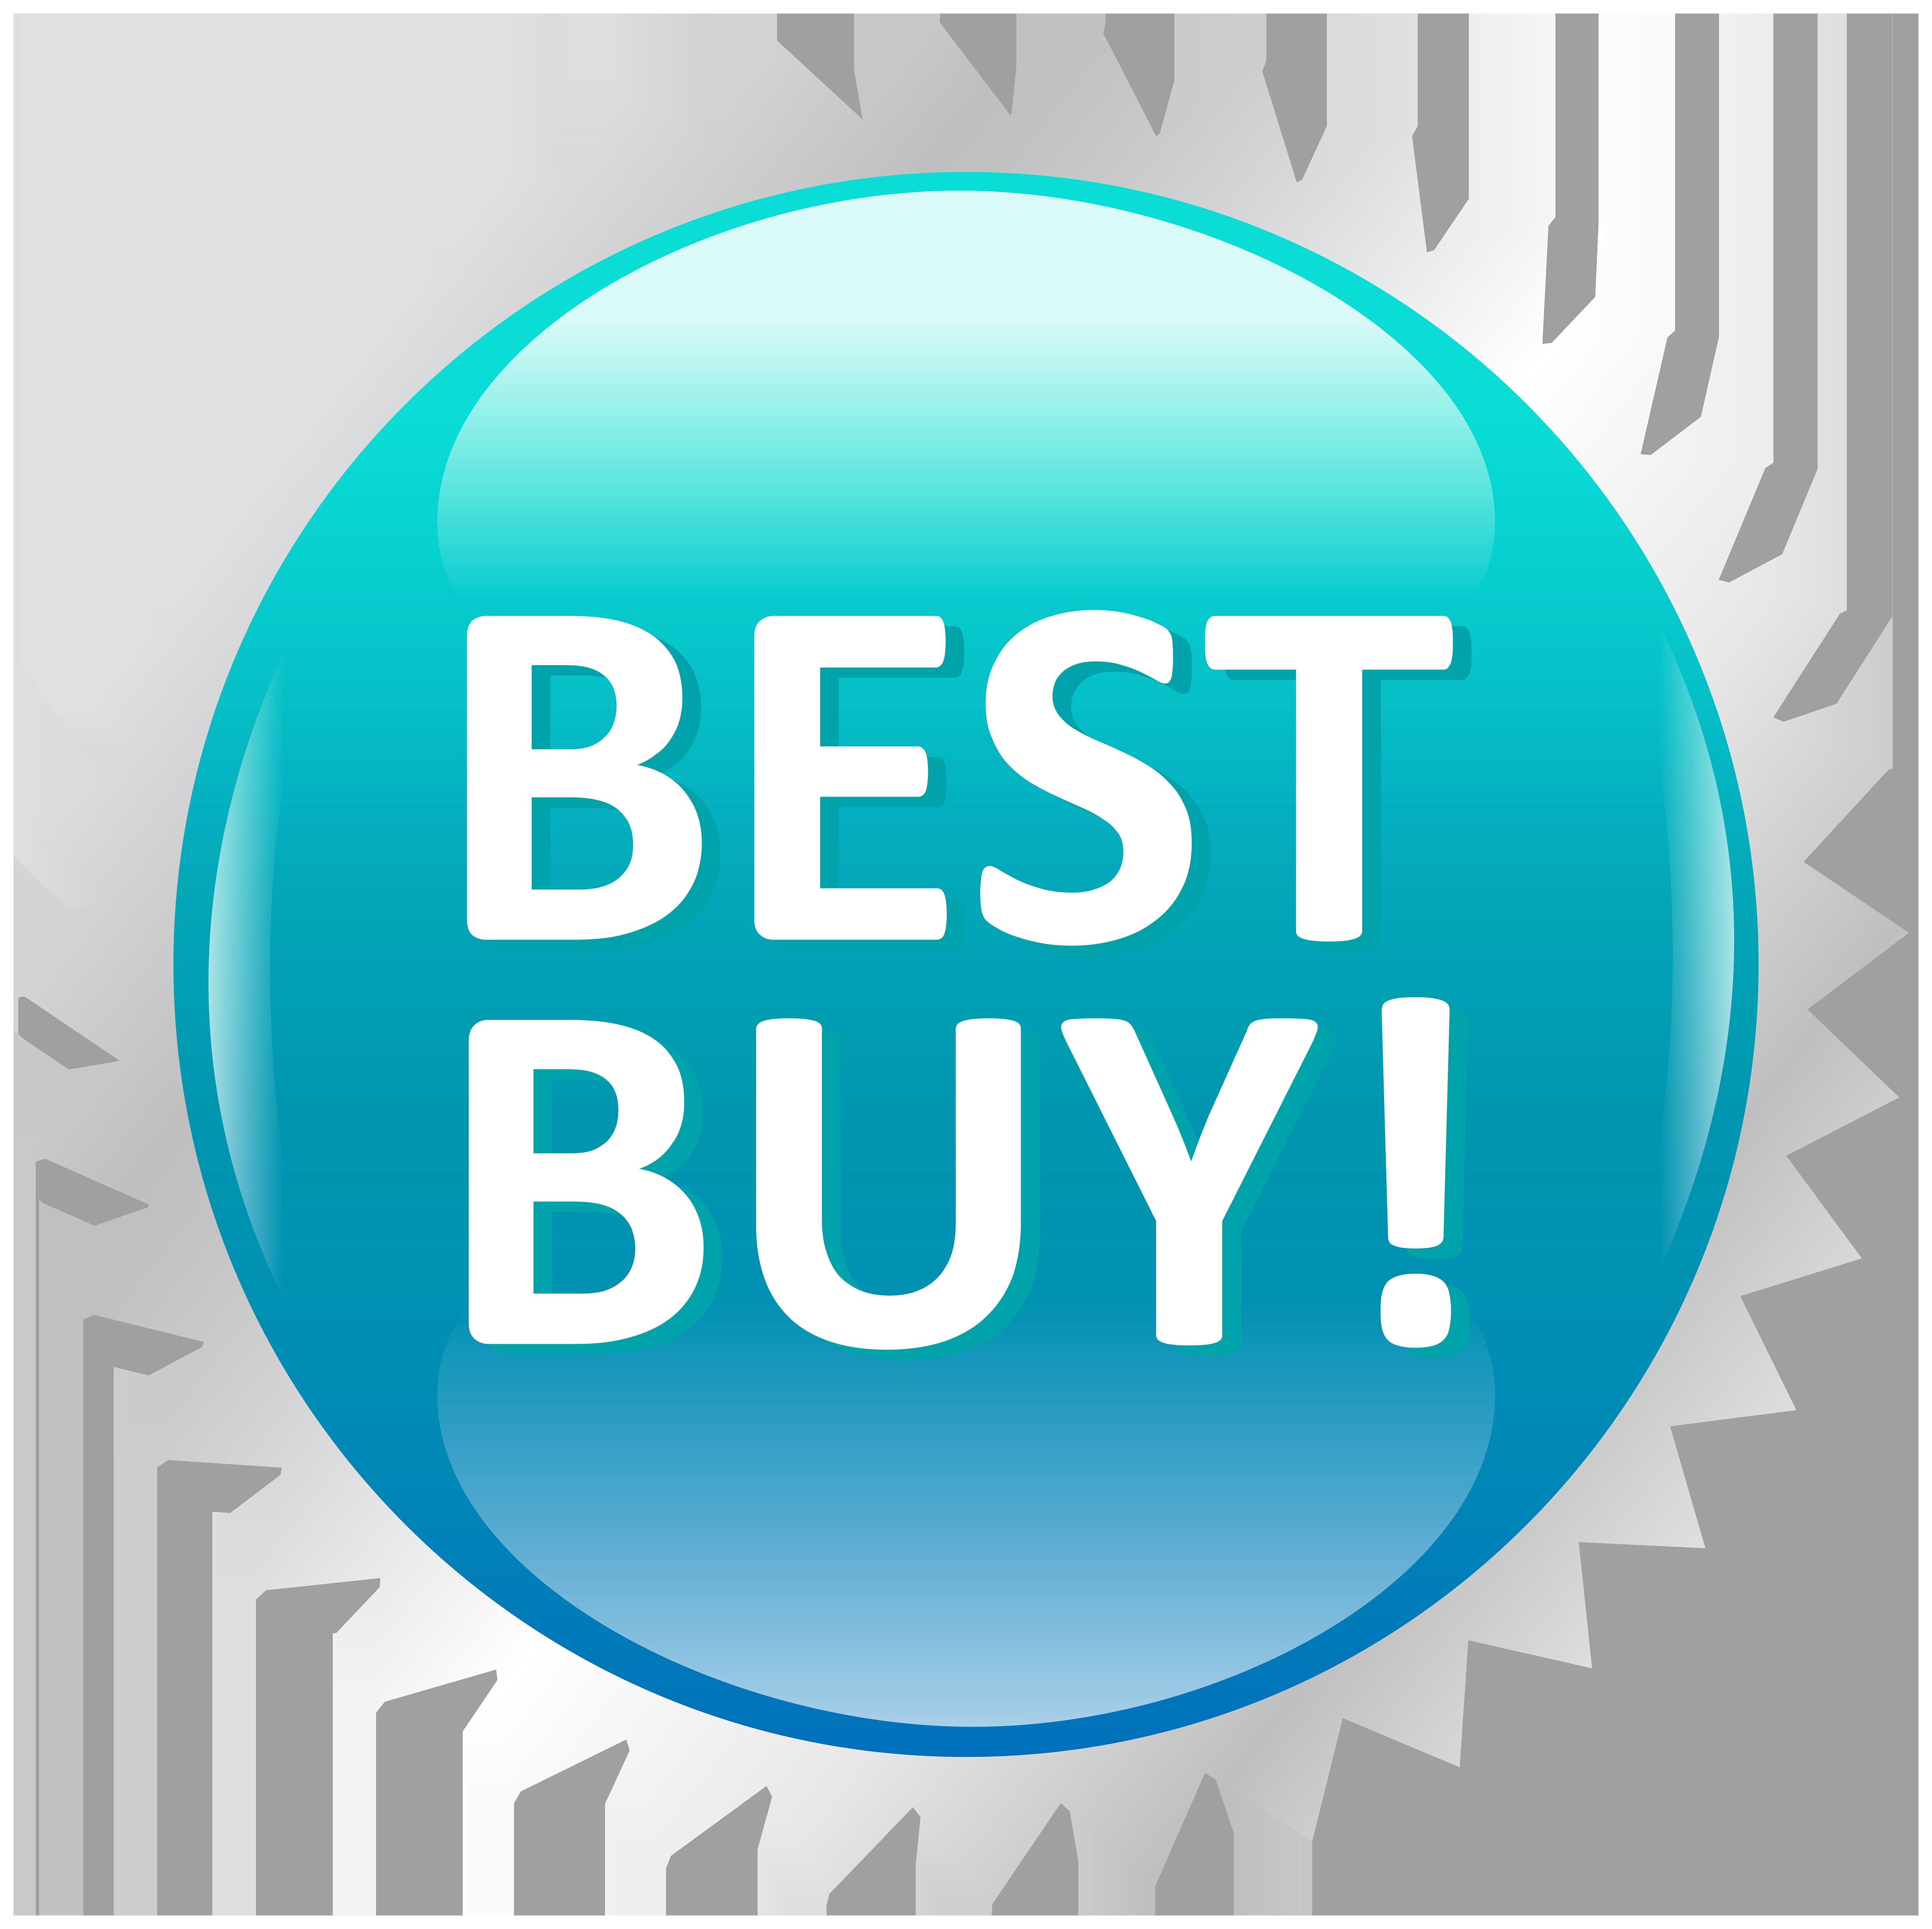 Best buy clipart svg free download Best Buy Sale Label PNG Clip Art Image   Gallery Yopriceville ... svg free download